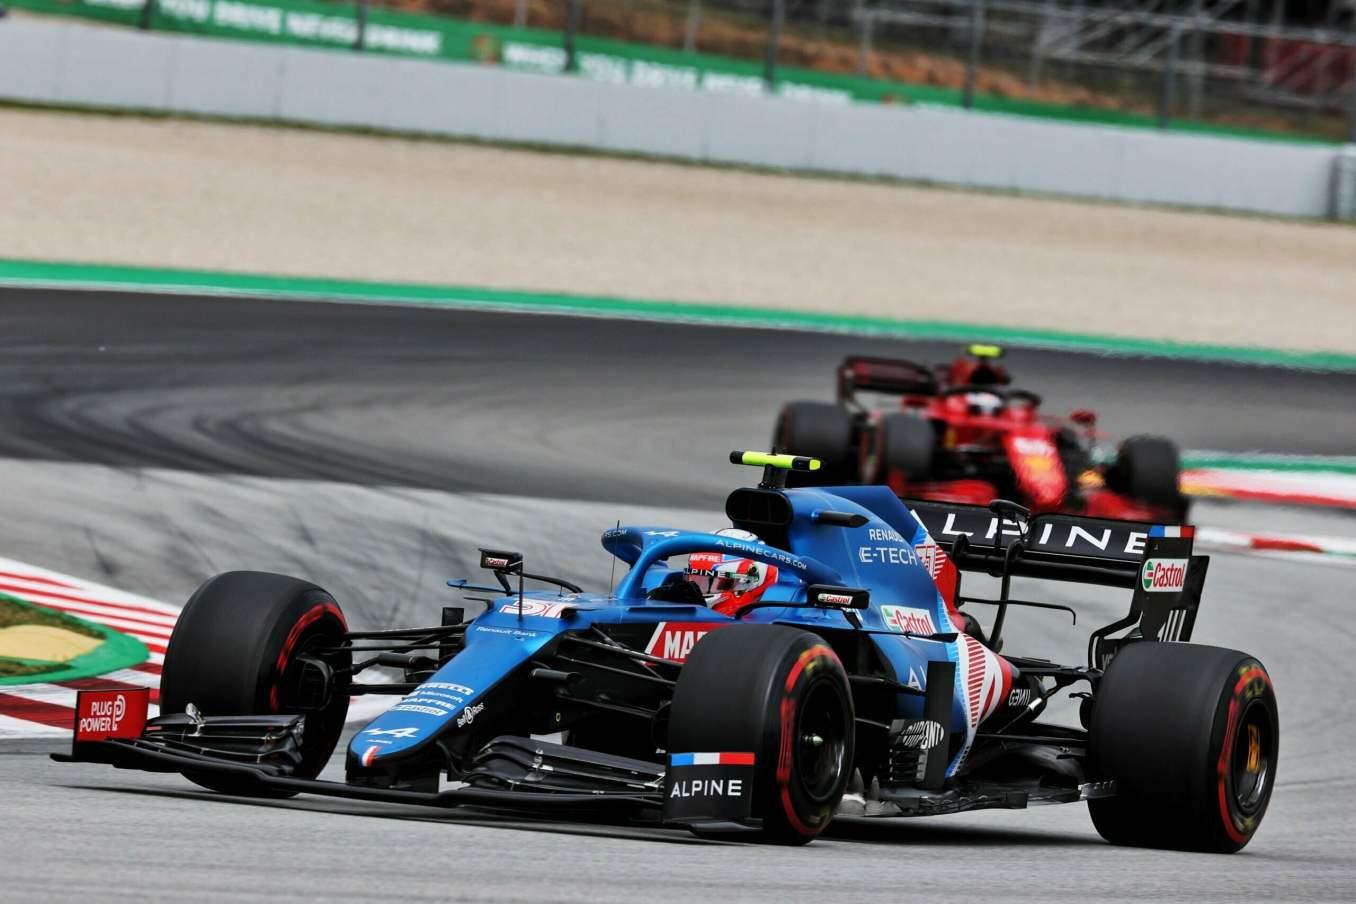 Alpine F1 Team A521 Alonso Ocon Grand Prix Espagne 2021 course 8 scaled   Alpine F1 Team n'a pas réussi à confirmer en course au GP d'Espagne 2021